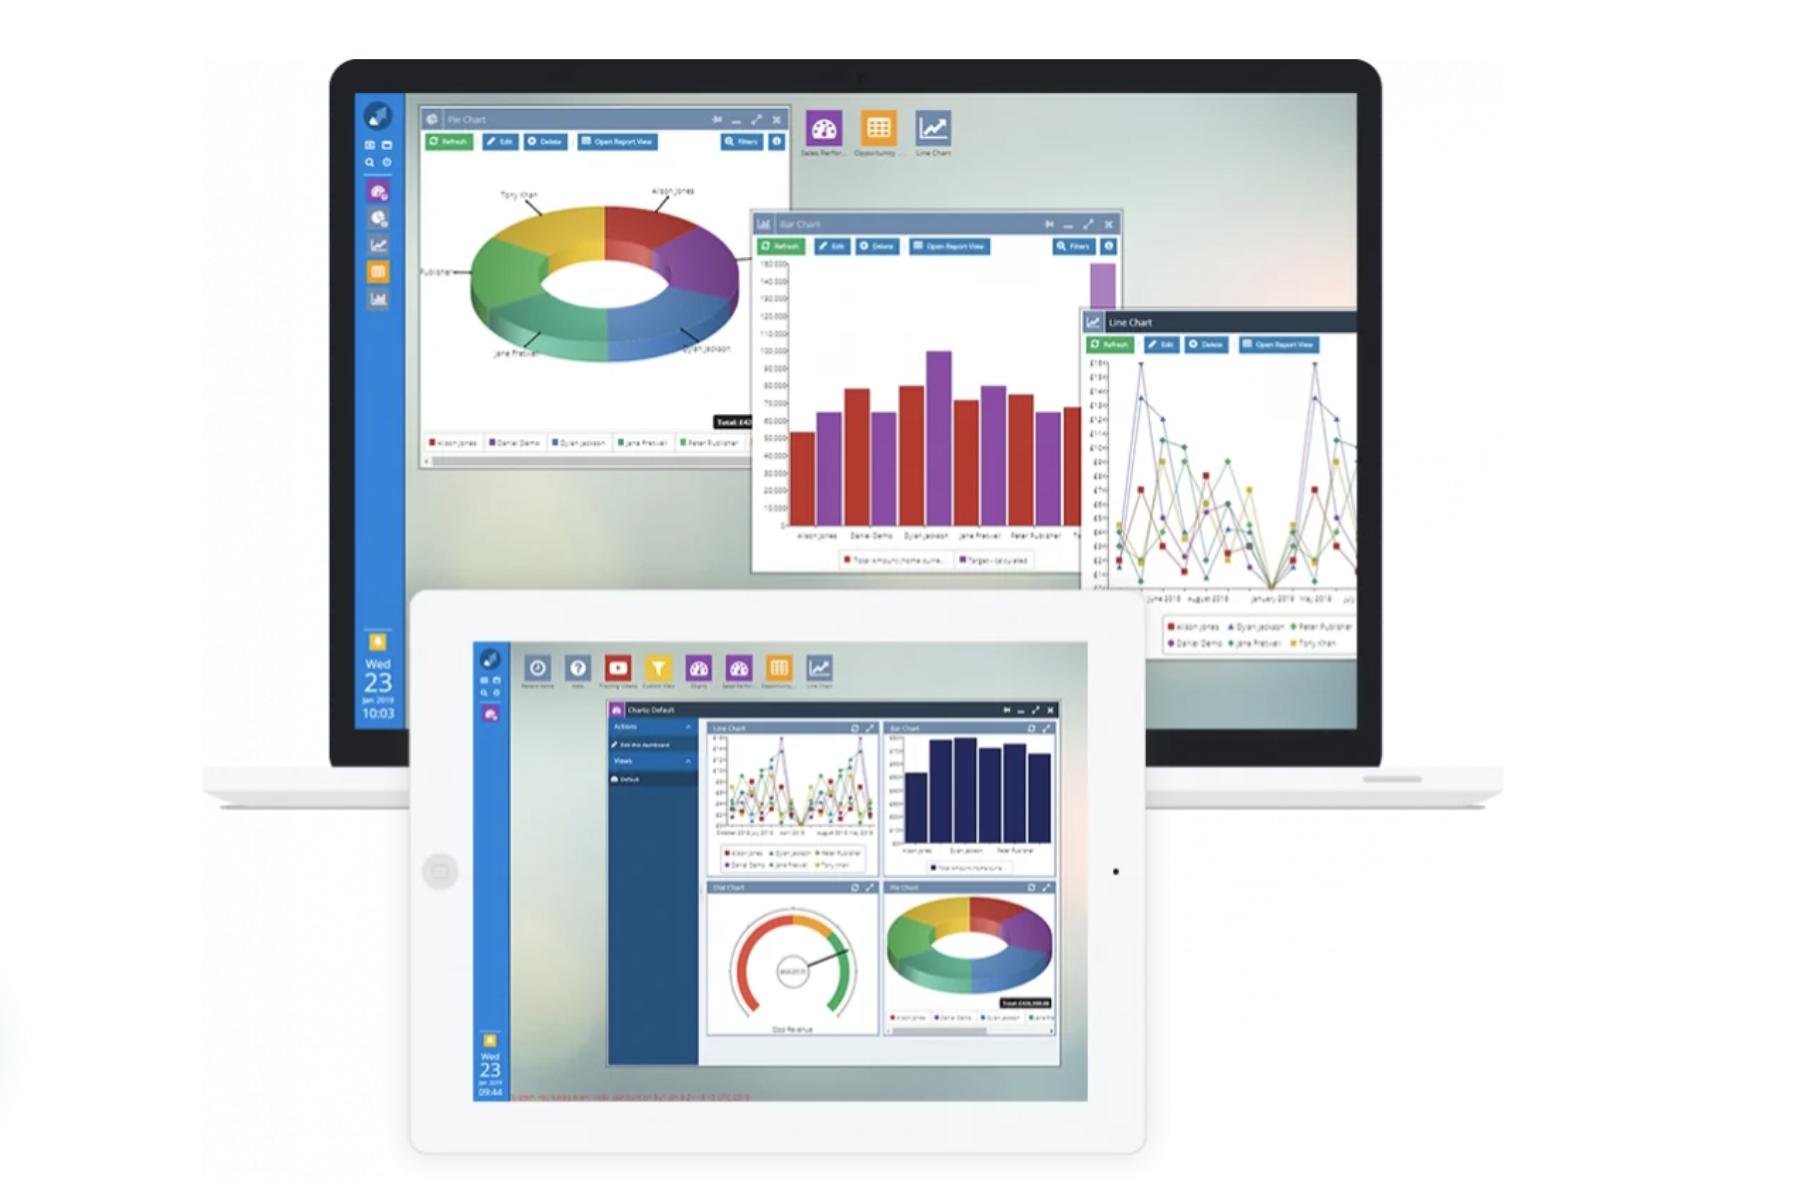 workbooks.com sales crm sales enablement management software